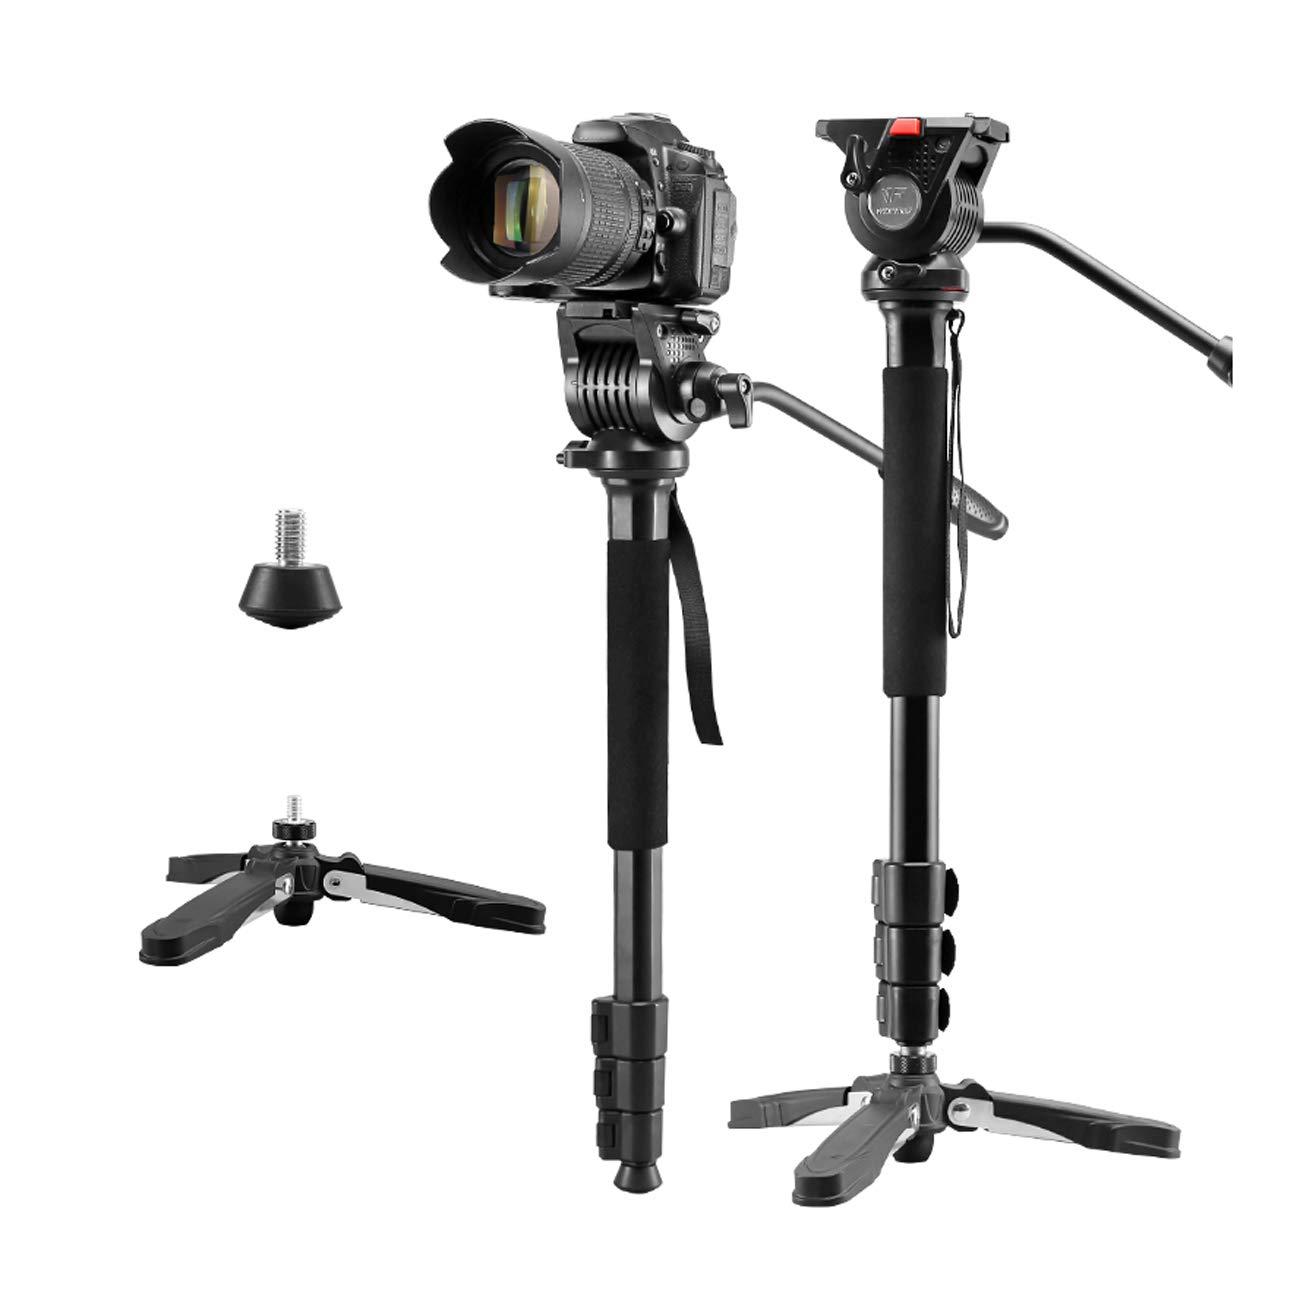 Gadget Place Neck Strap Quick Install Screw for Nikon Df D800 D800E D610 D7100 D5300 D3300